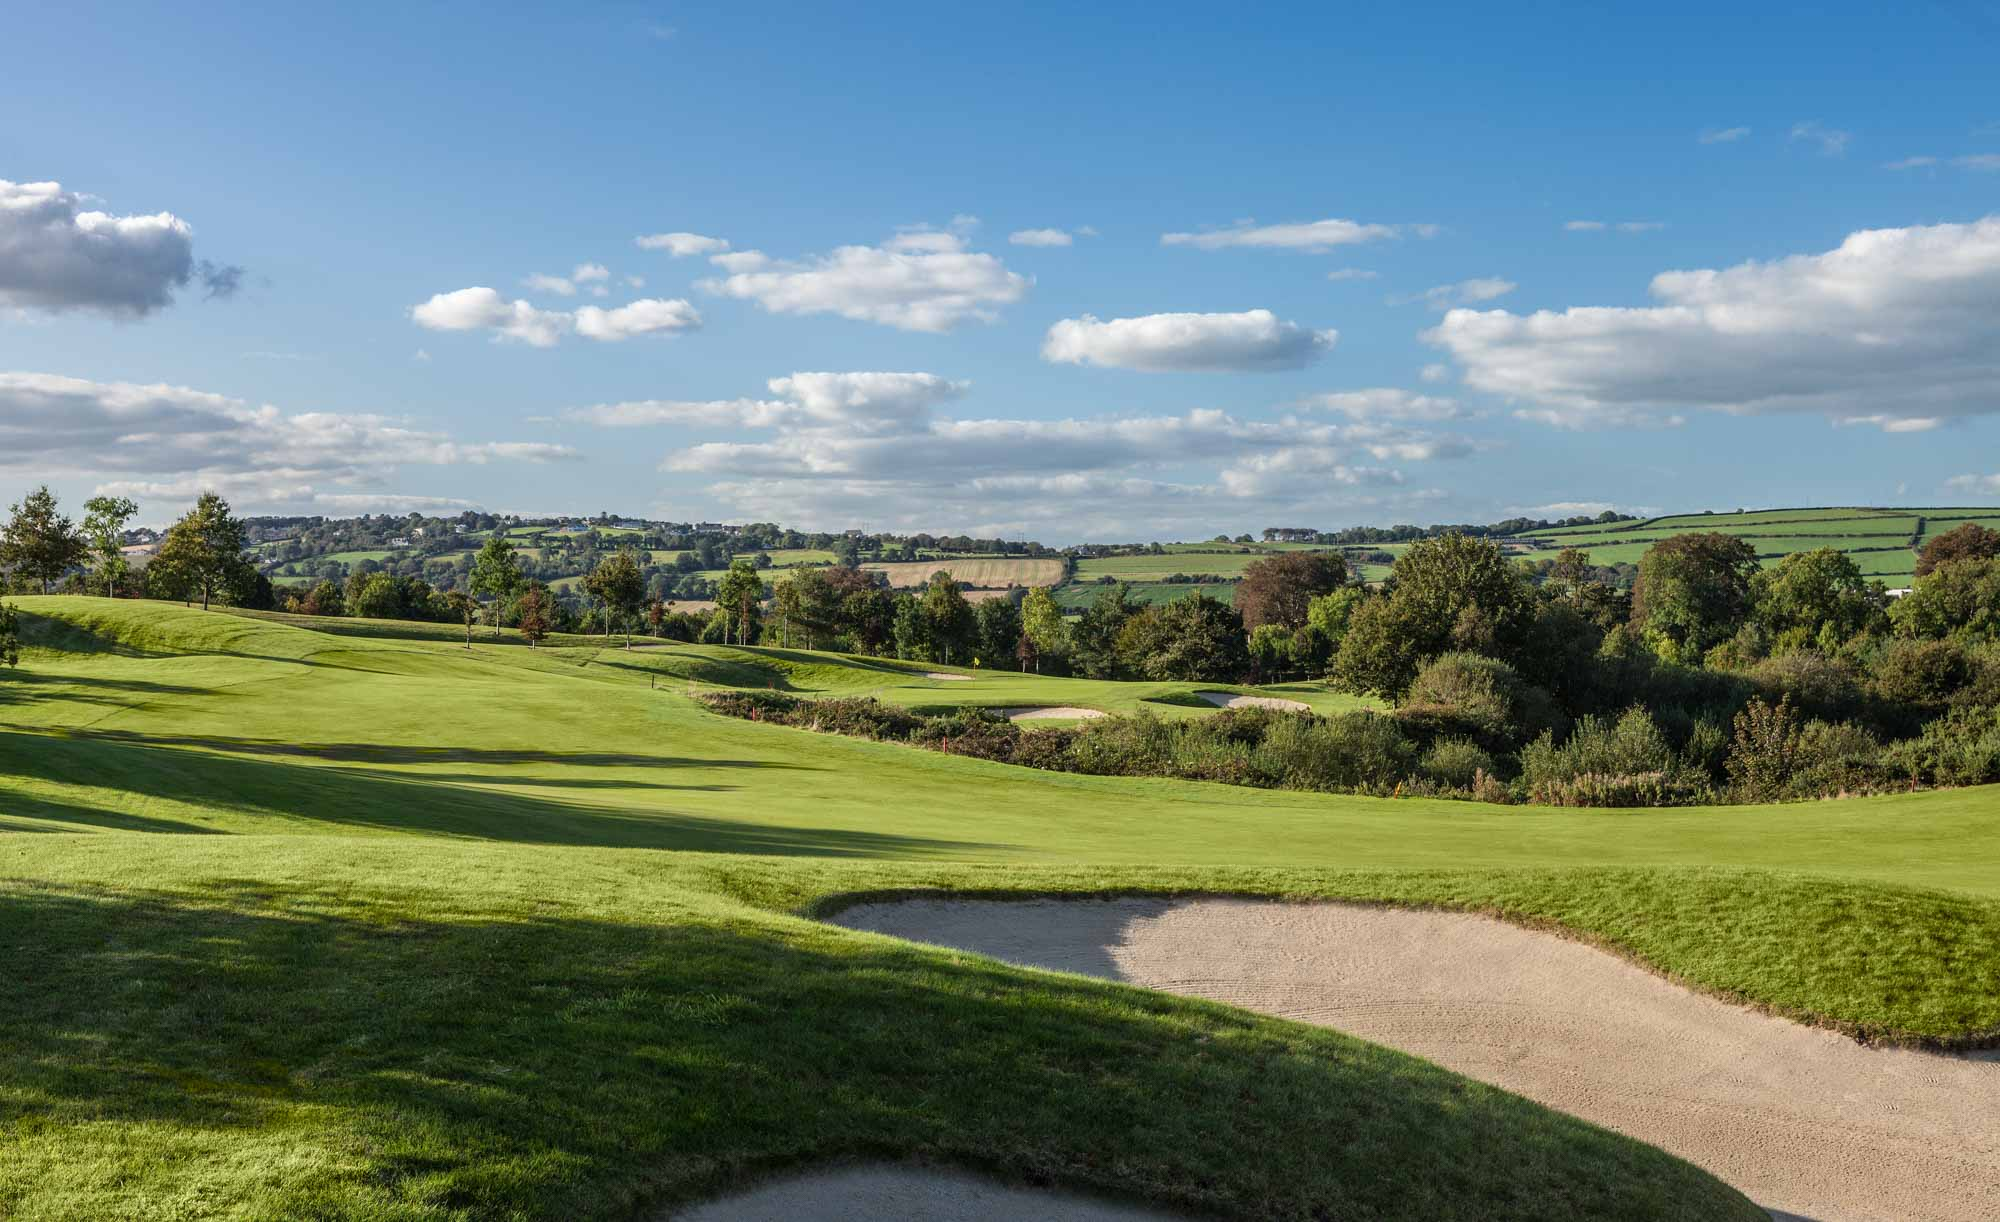 A photo of the Deerpark Course at Fota Island Golf Club Cork.